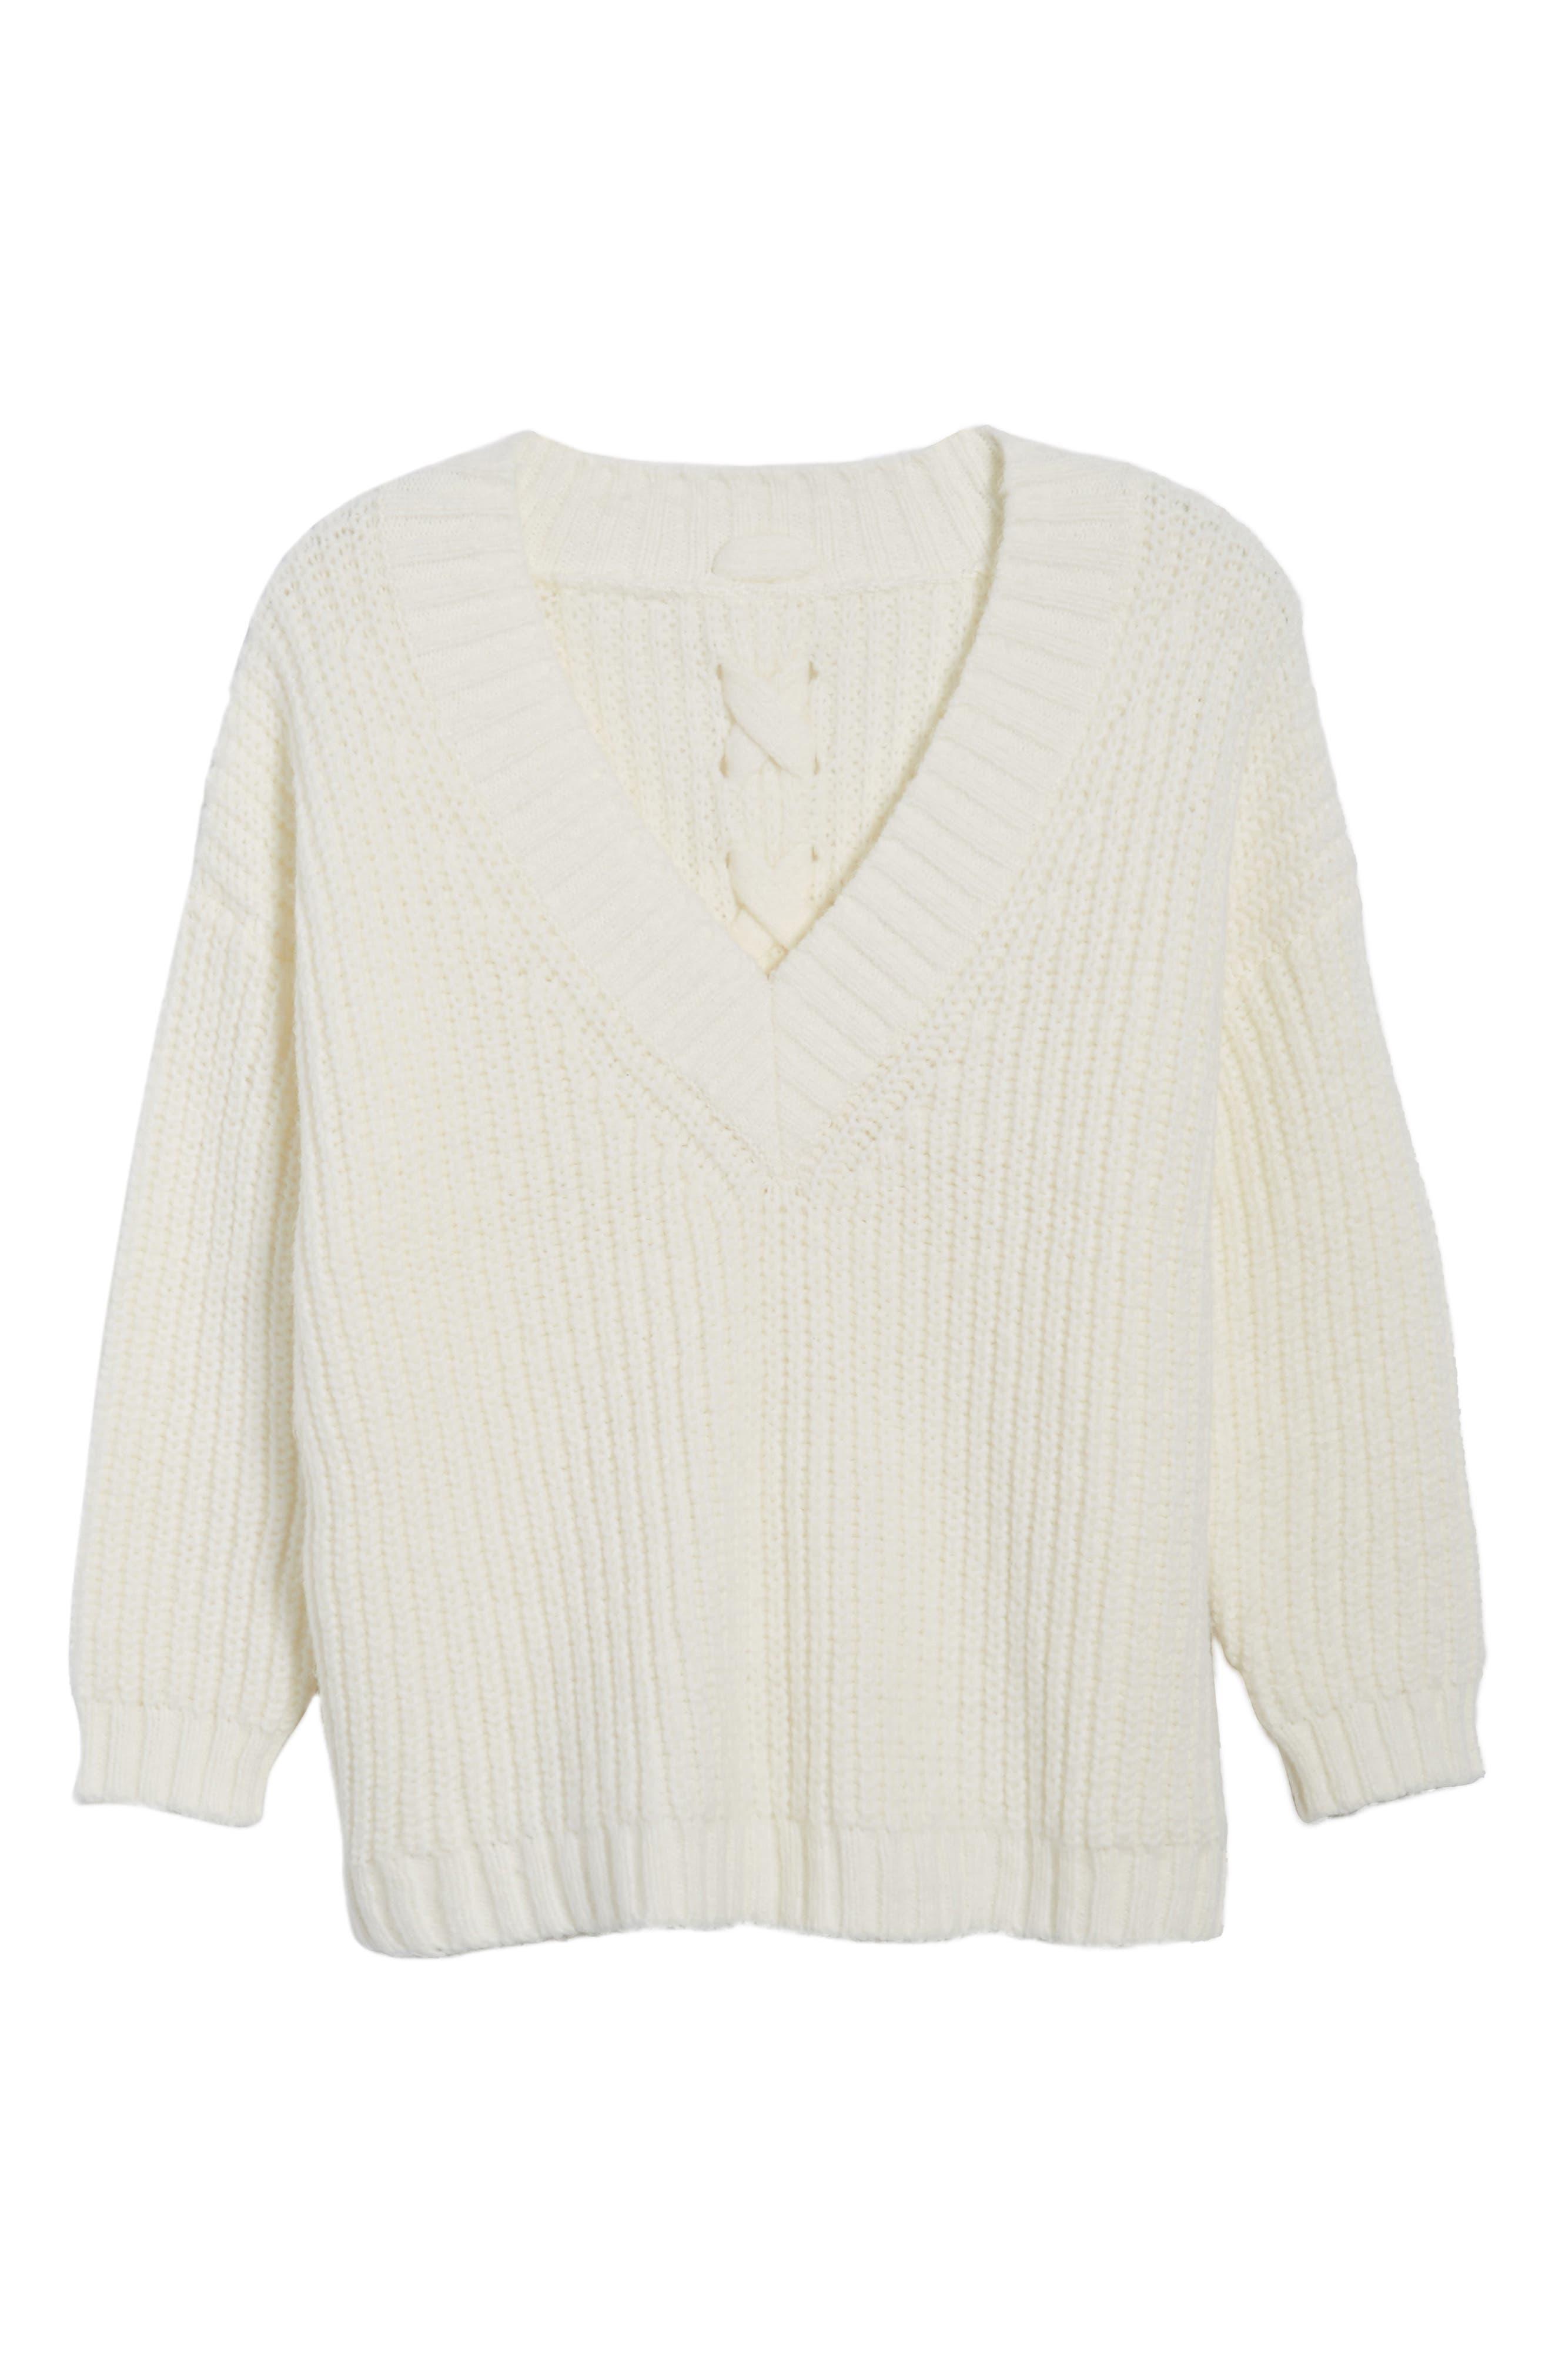 Lace Up Back V-Neck Sweater,                             Alternate thumbnail 6, color,                             Cream